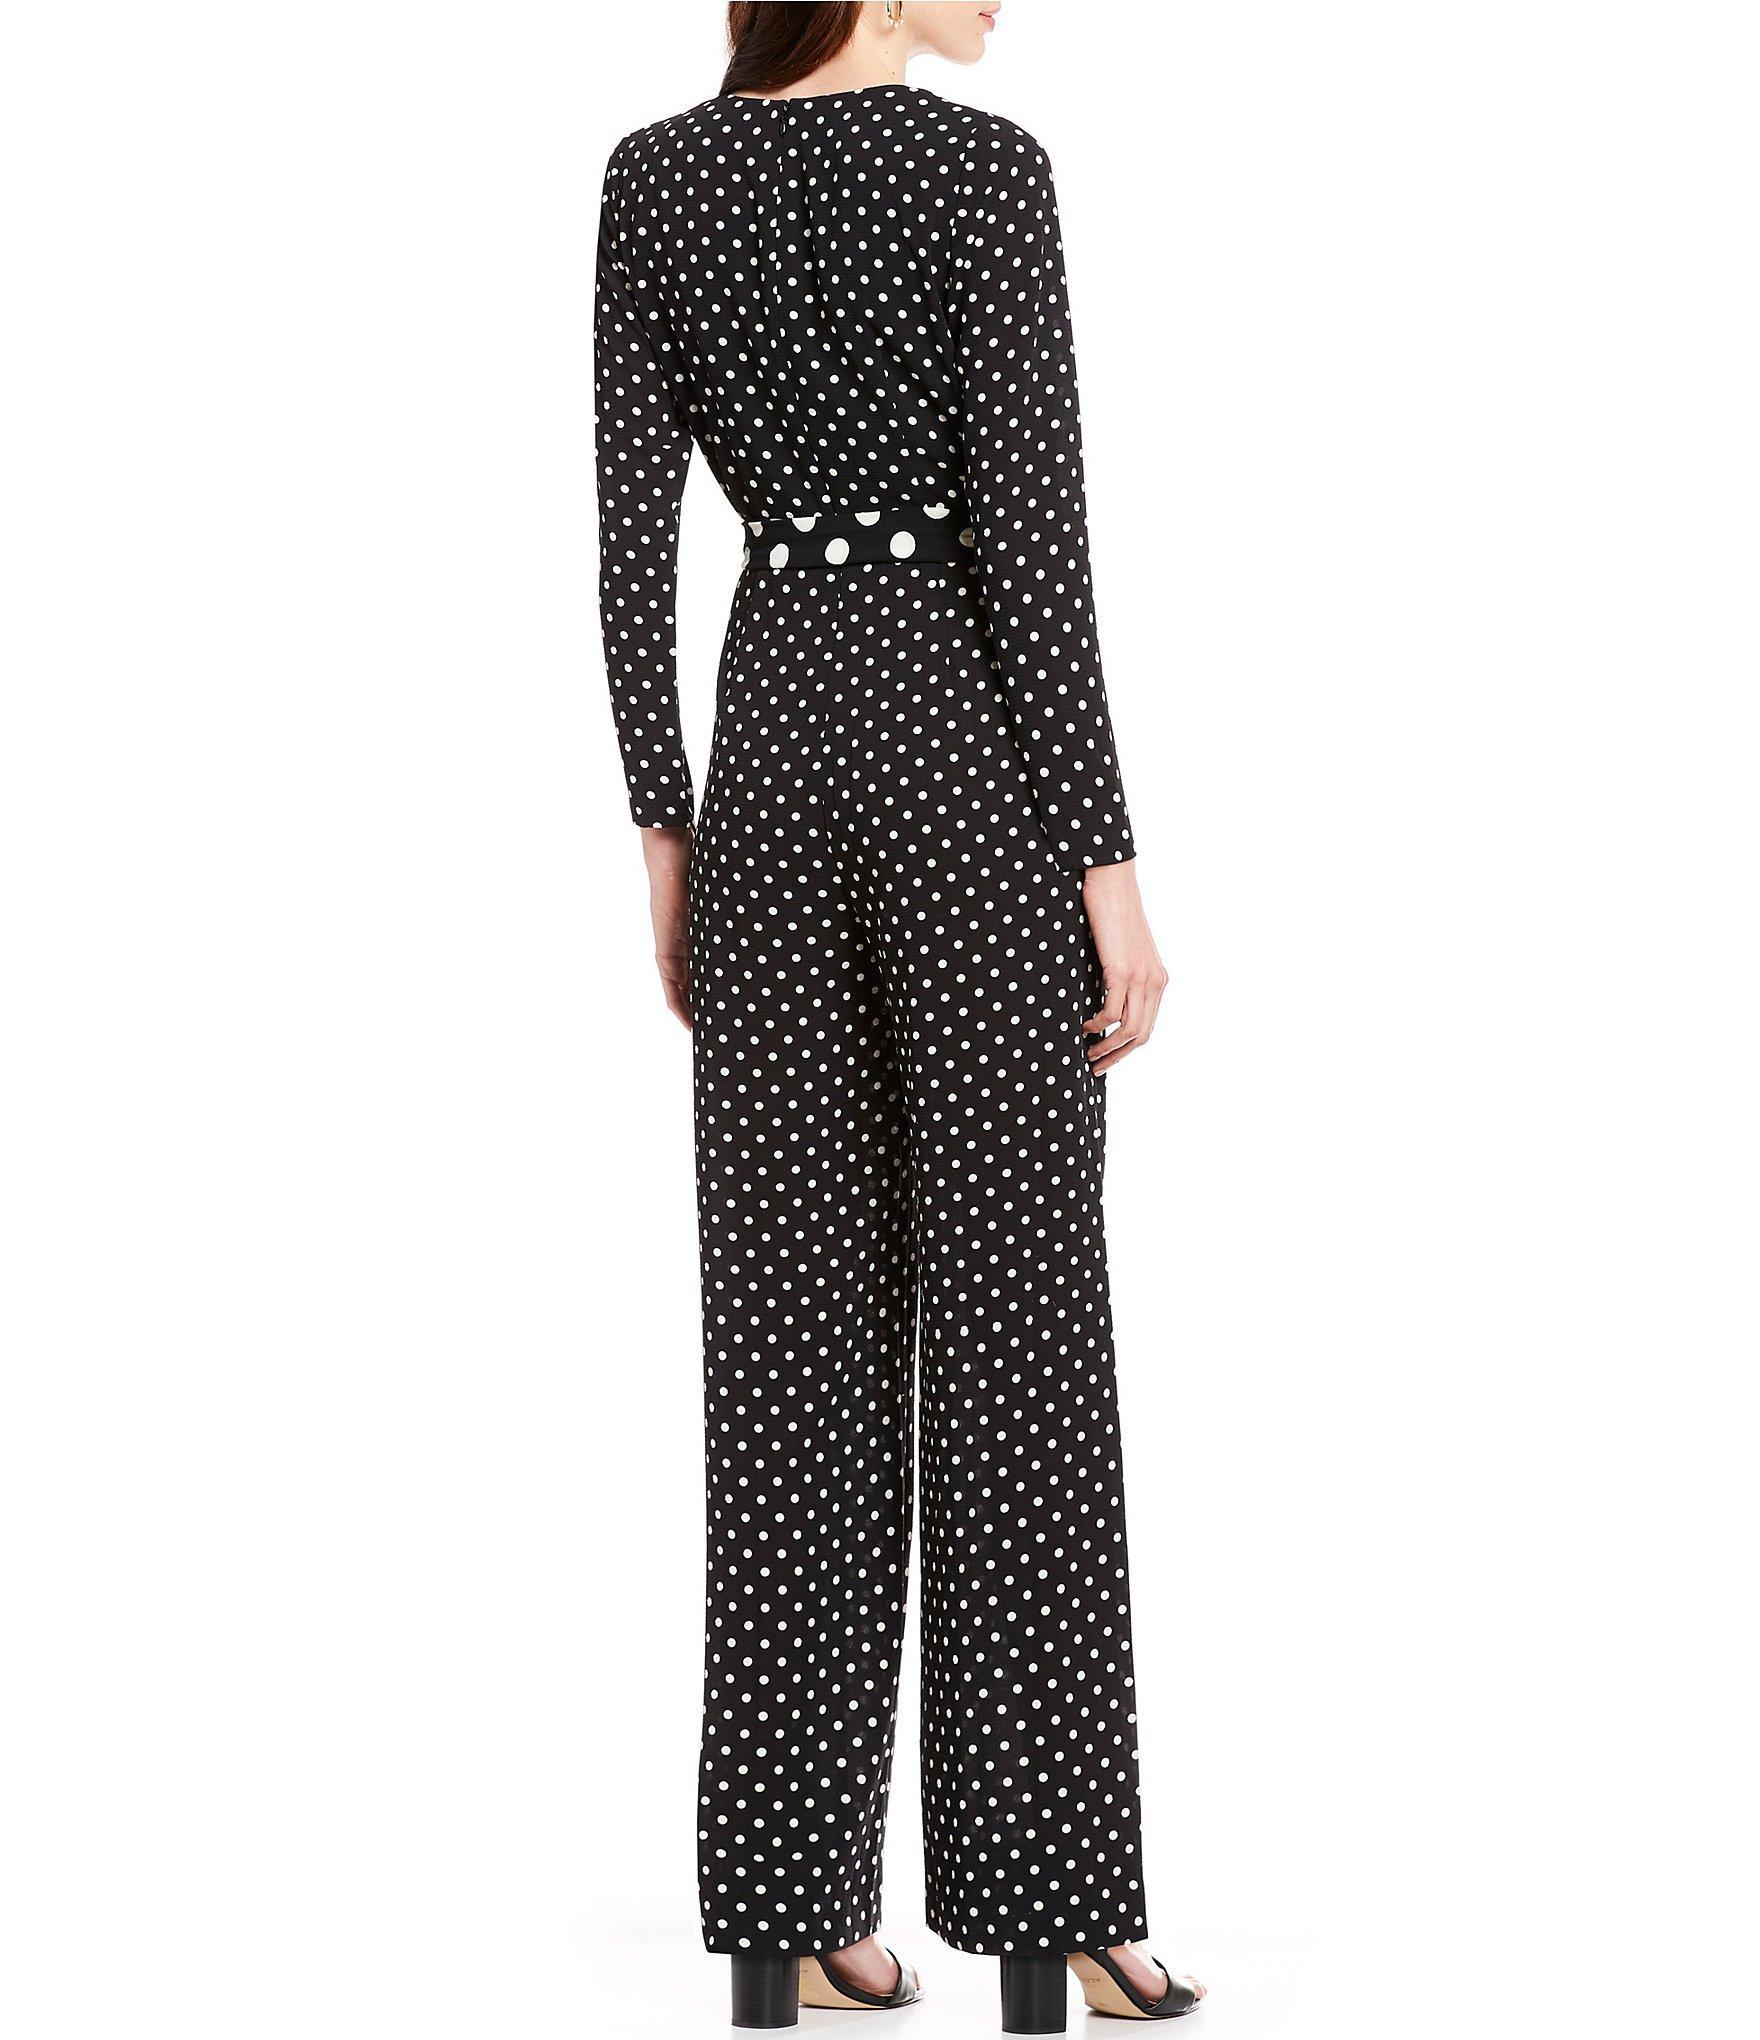 fe372a085163e Eliza J - Black Polka Dot V-neck Tie Waist Jumpsuit - Lyst. View fullscreen